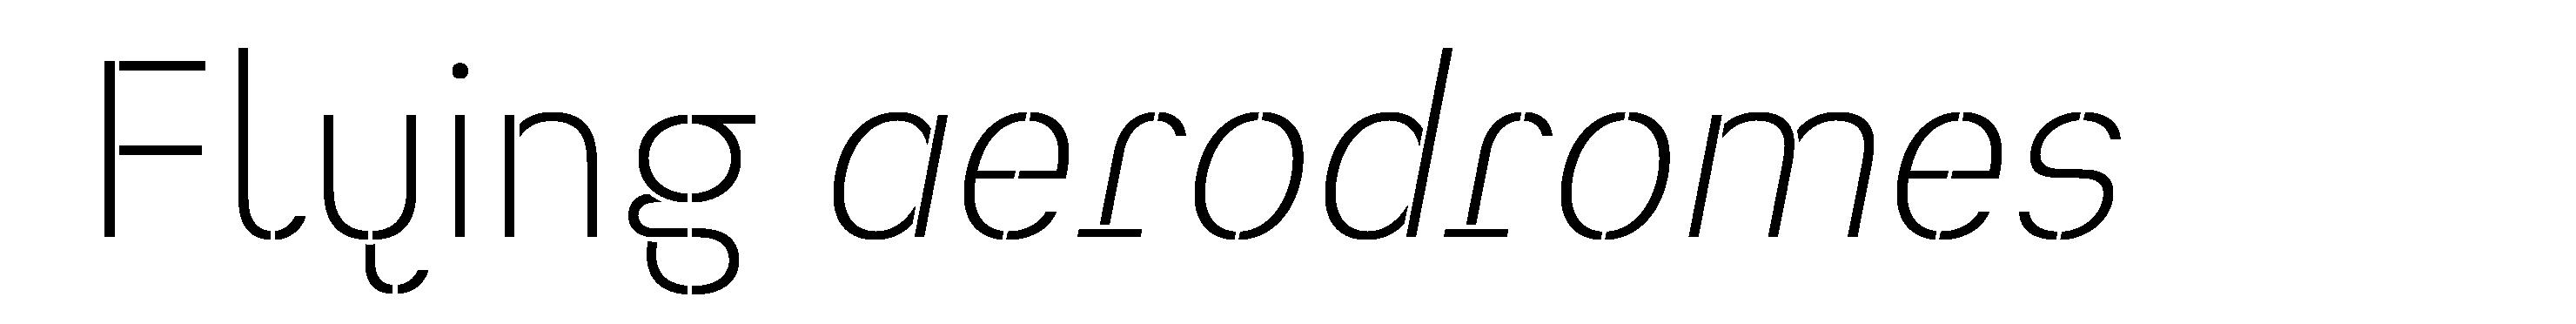 Typeface Heimat Stencil D01 Atlas Font Foundry